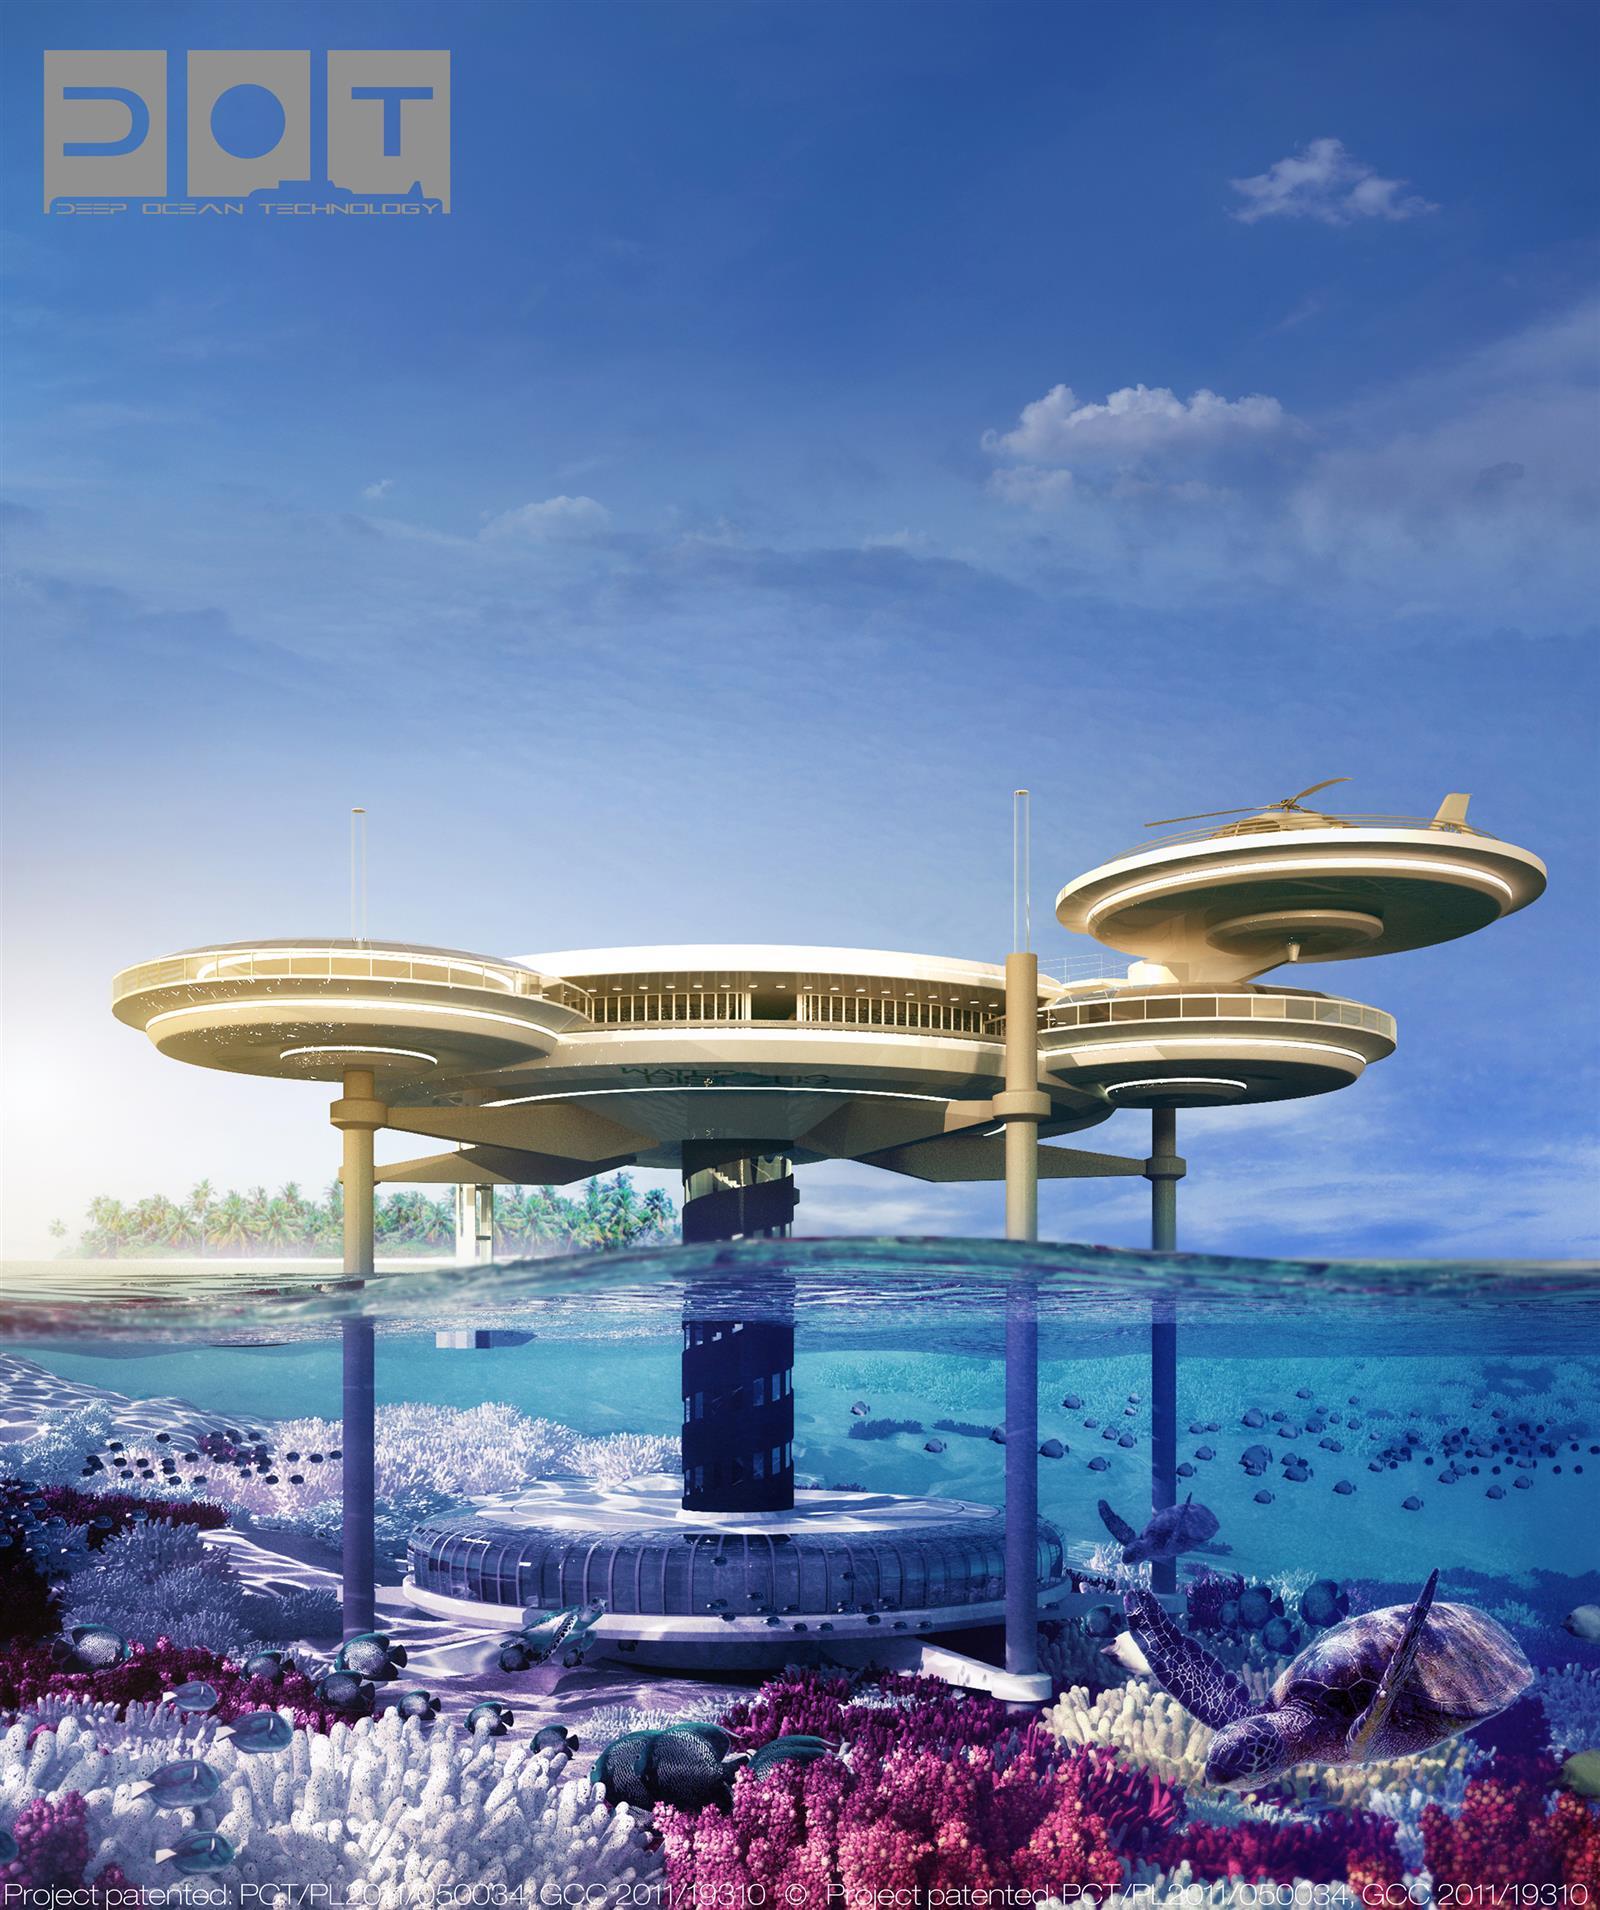 Water Discus Underwater Hotels In Dubai (3)